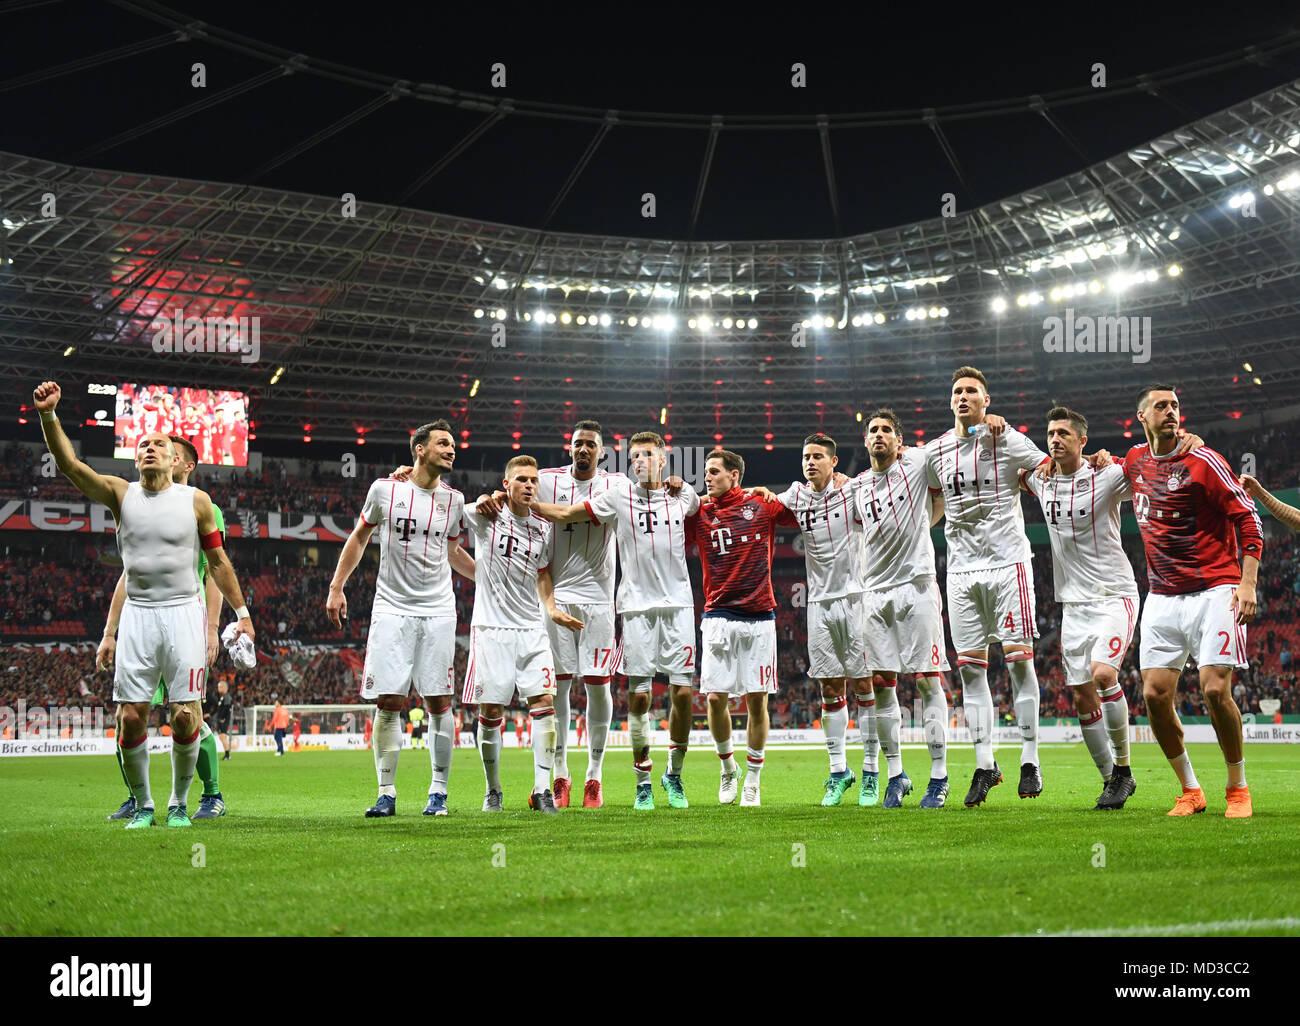 17 April 2018 Leverkusen Deutschland Fussball Dfb Pokal